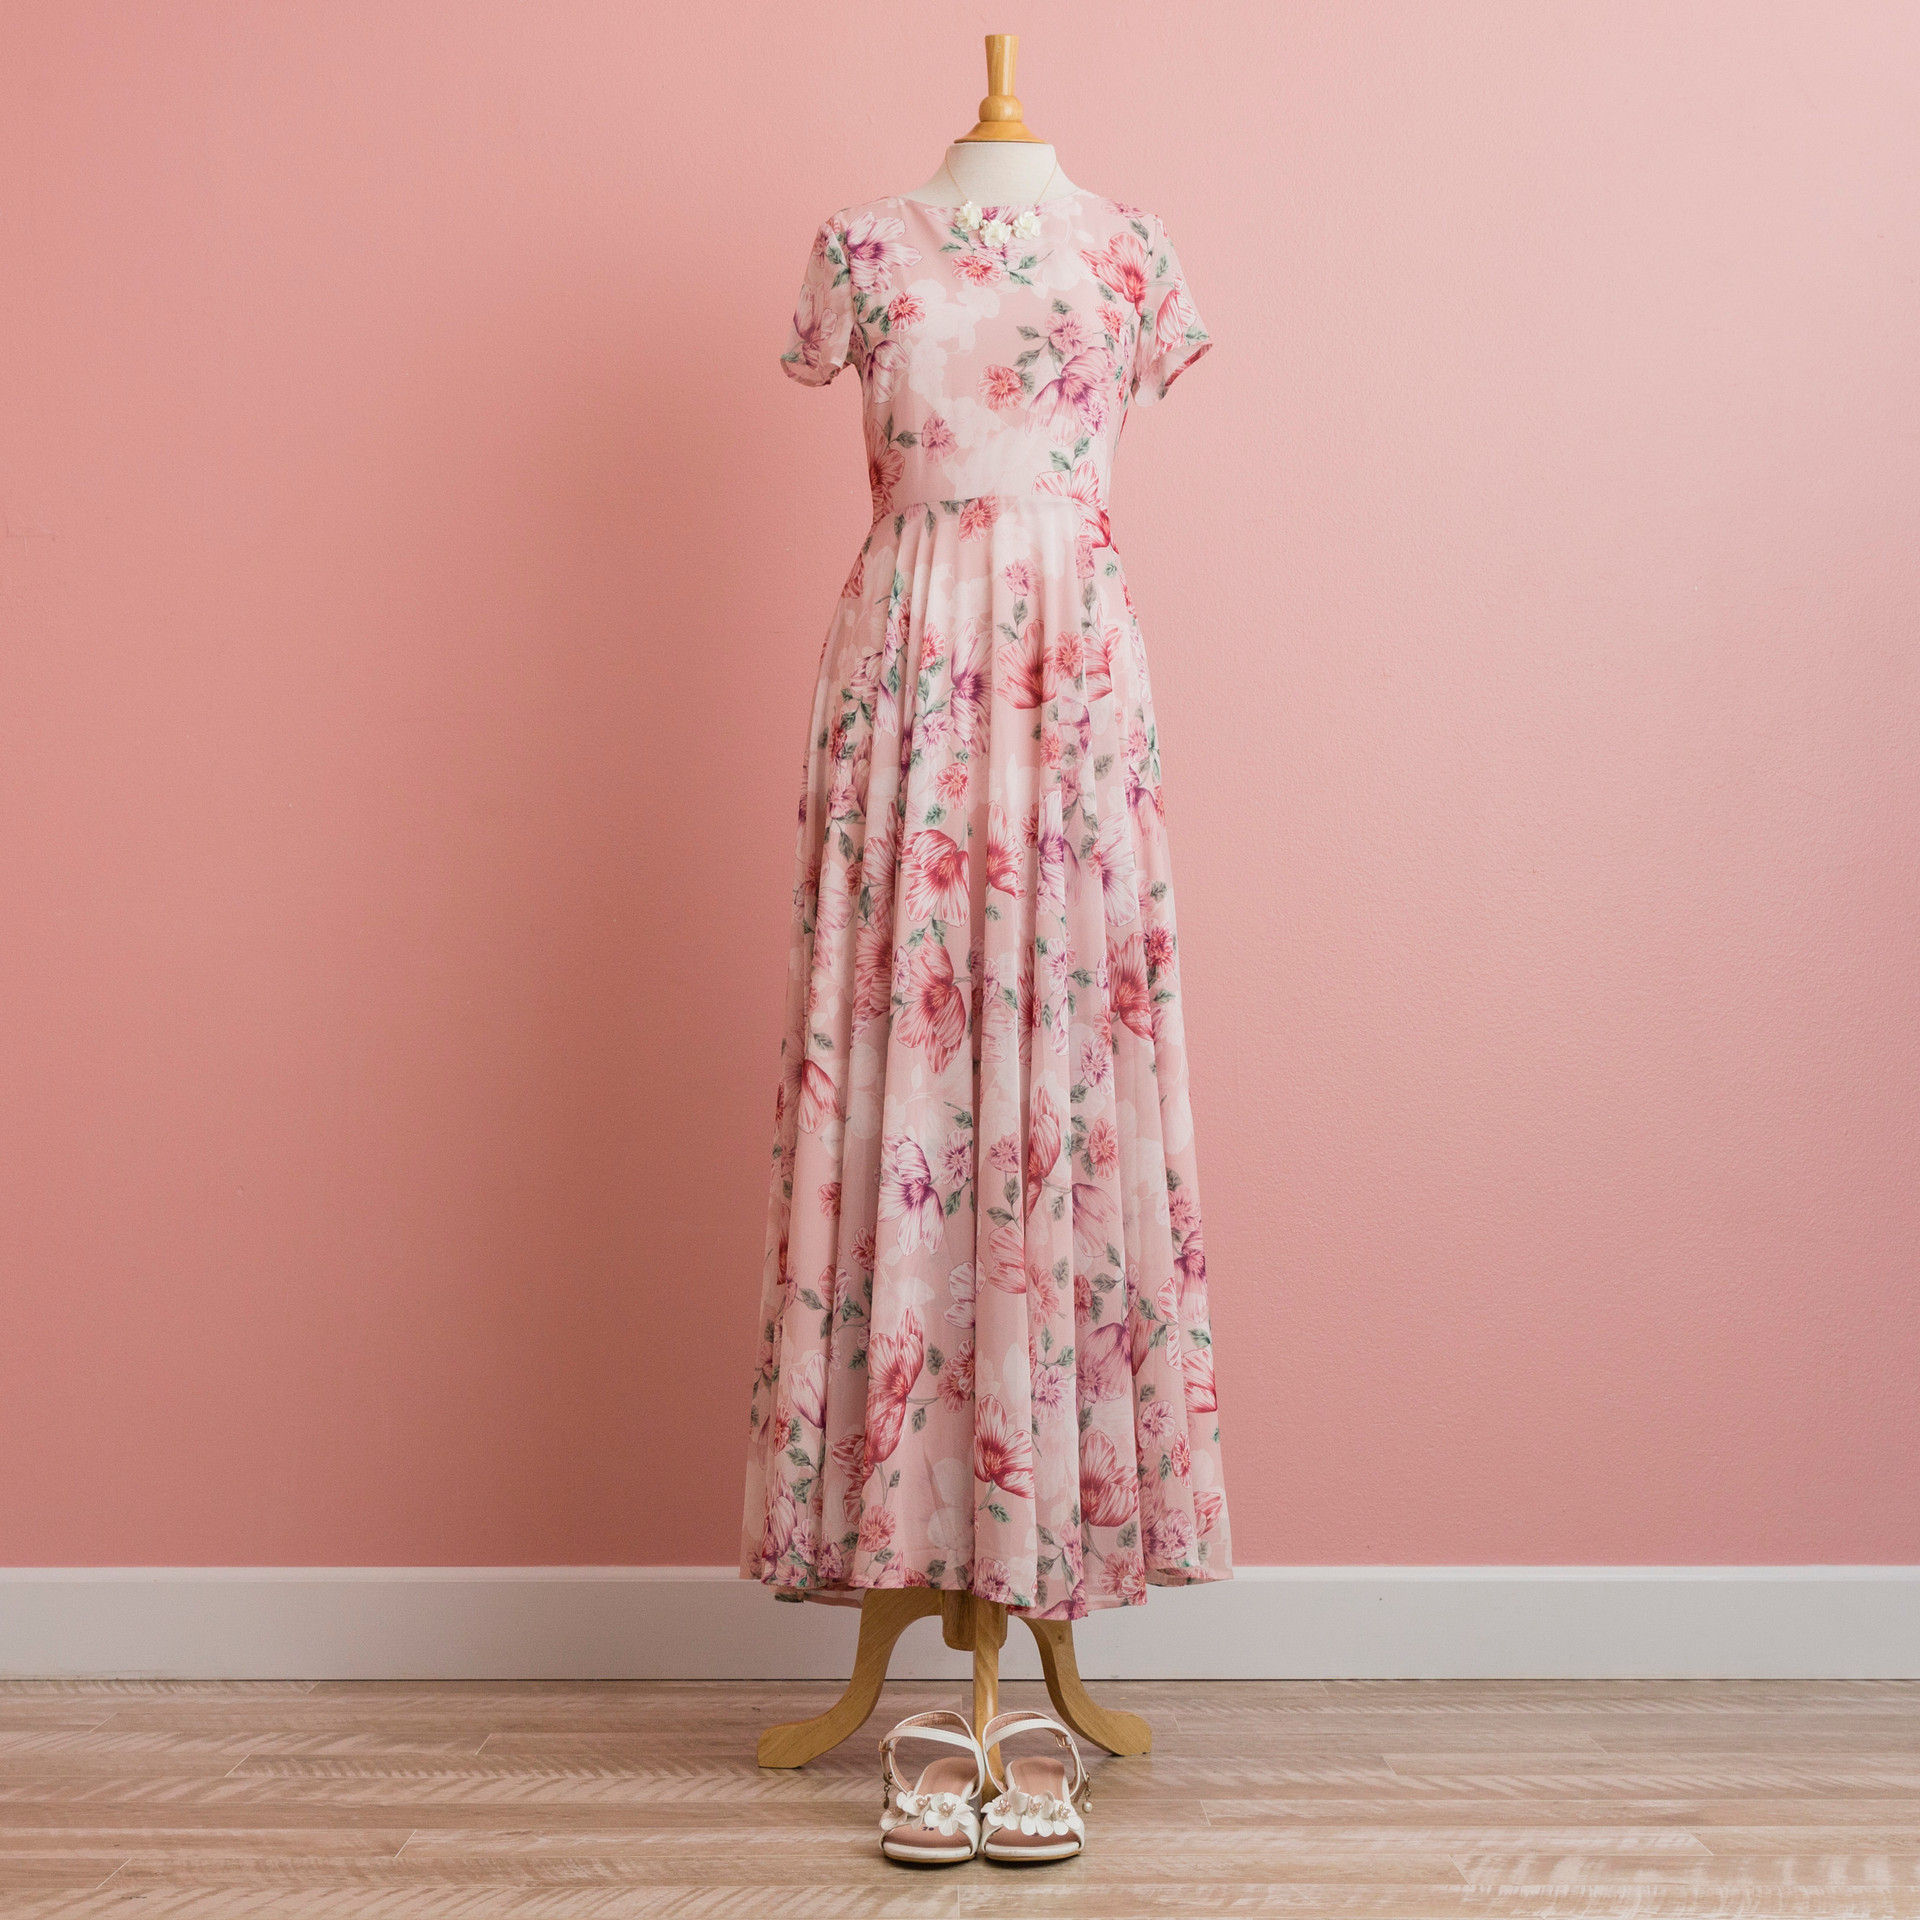 Flower shower dress:PD2199PI9102